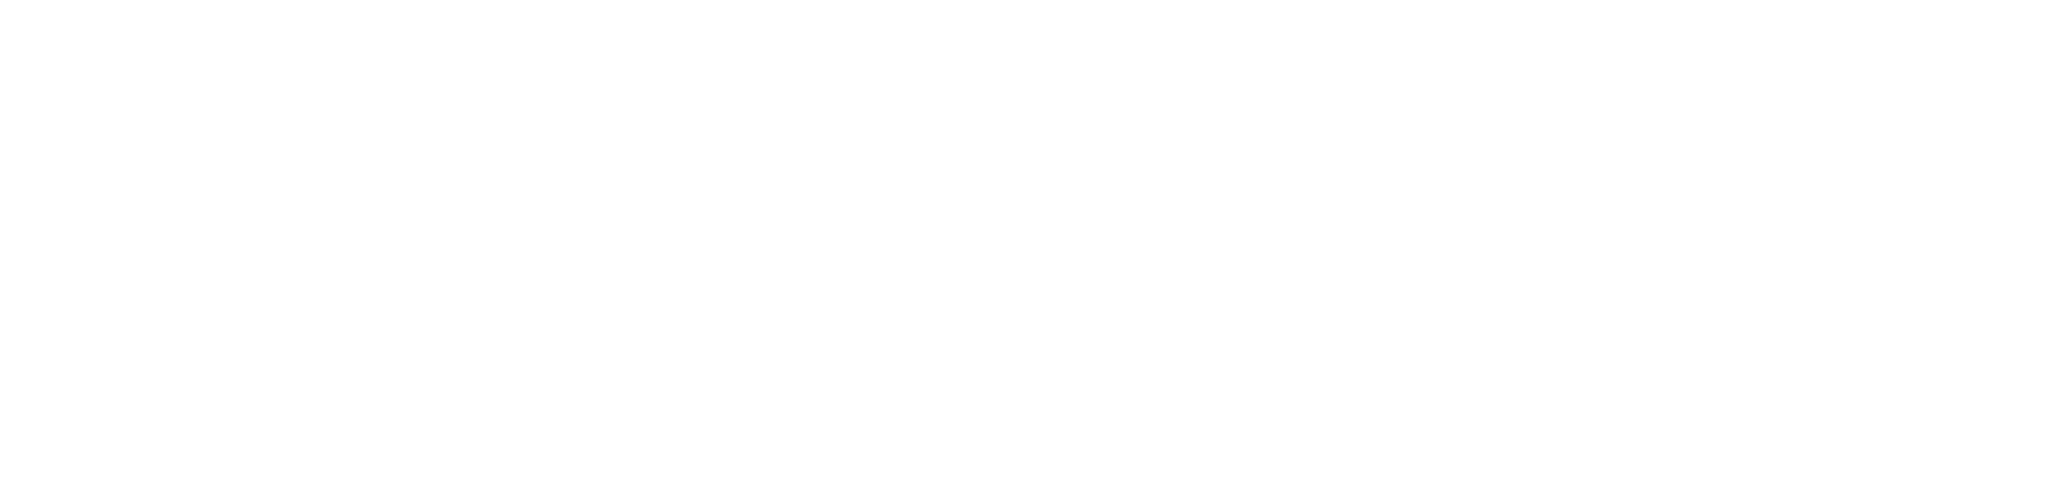 Jordan Mulson - Digital Media and Marketing